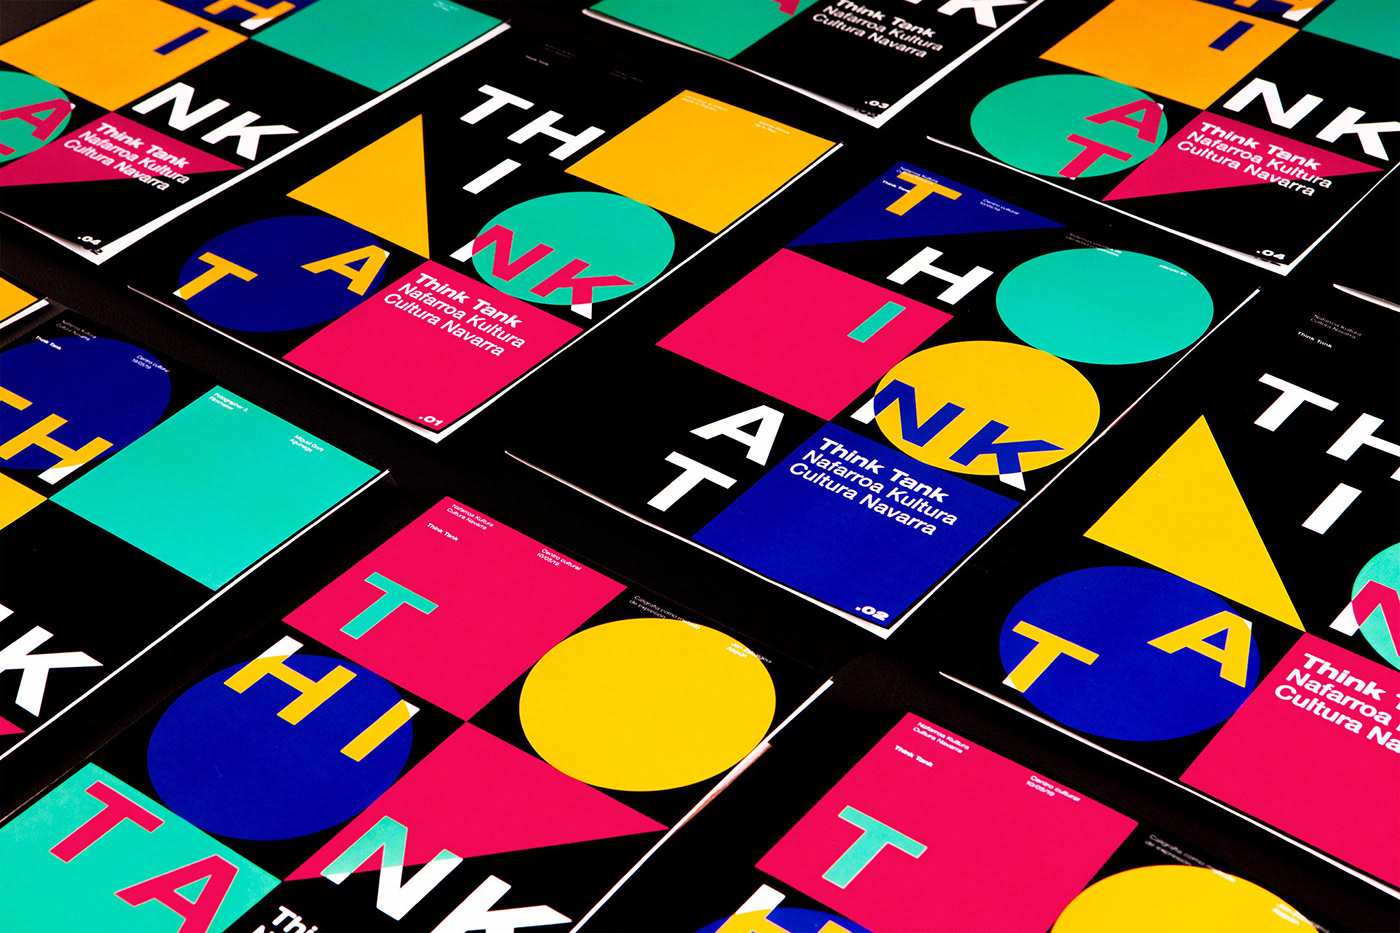 diseño gráfico ilustrator identidad design cartel after effects photoshop animation